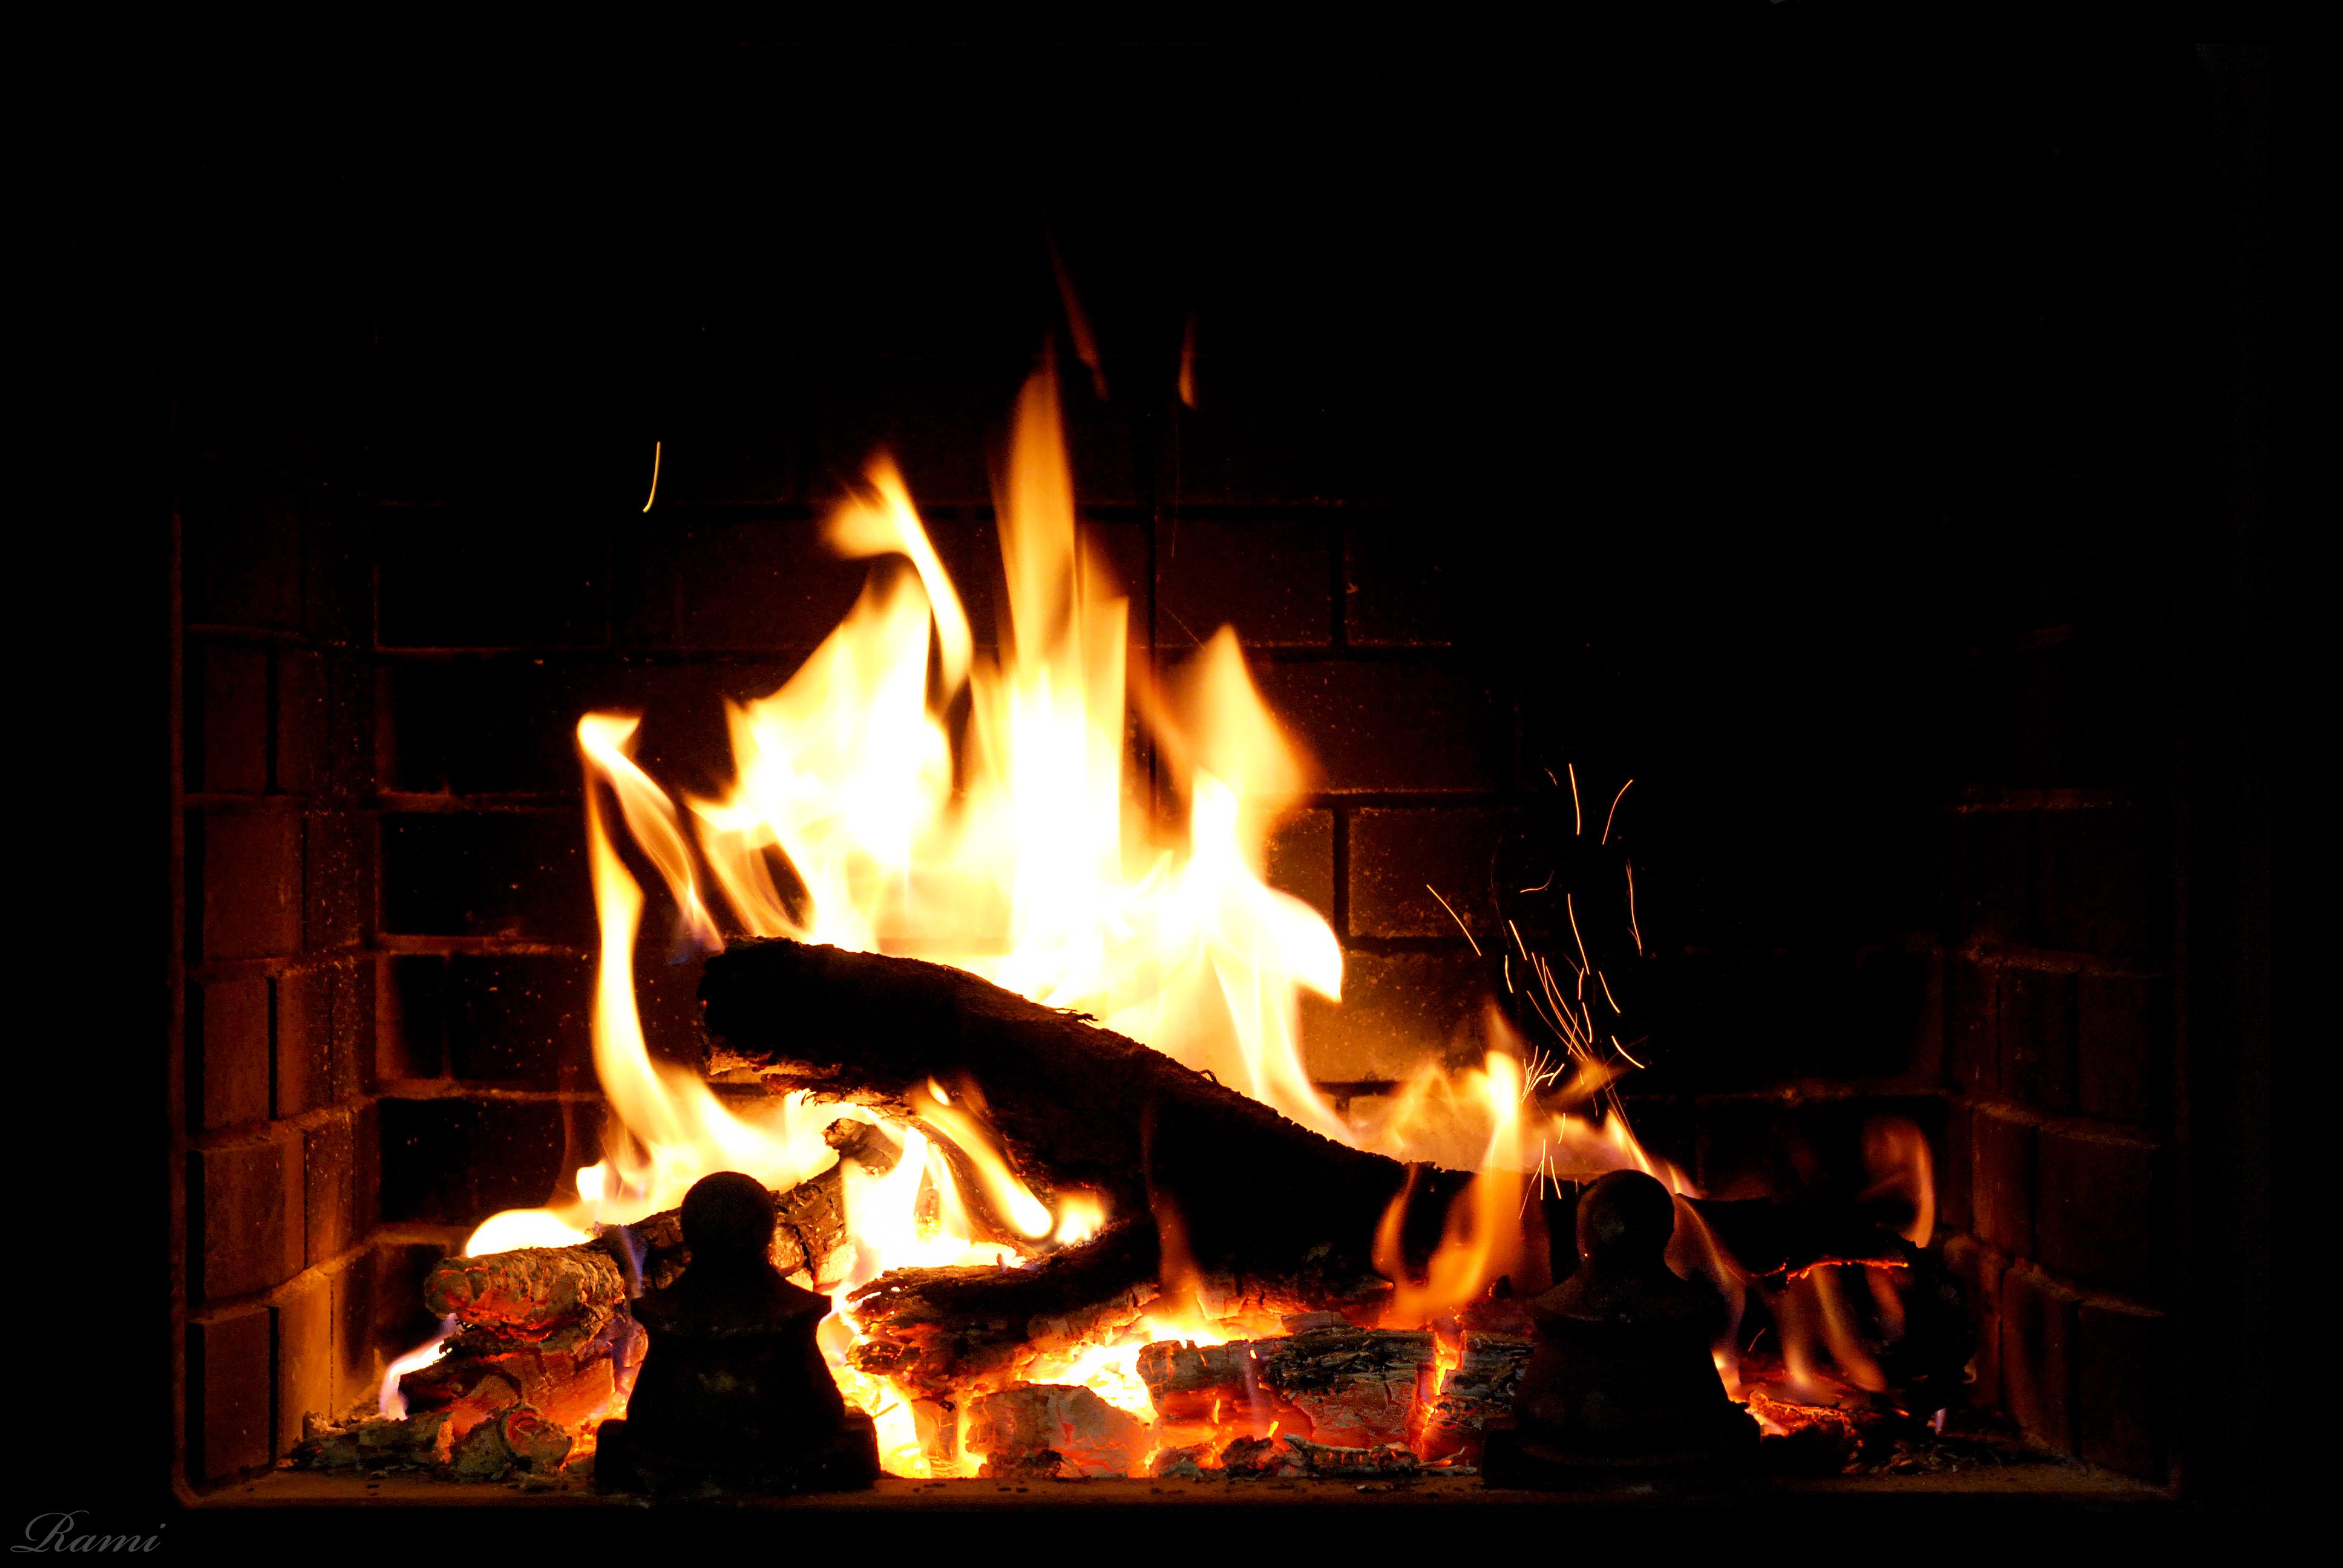 fireplace firewood flicker flame christmas - HD3872×2592